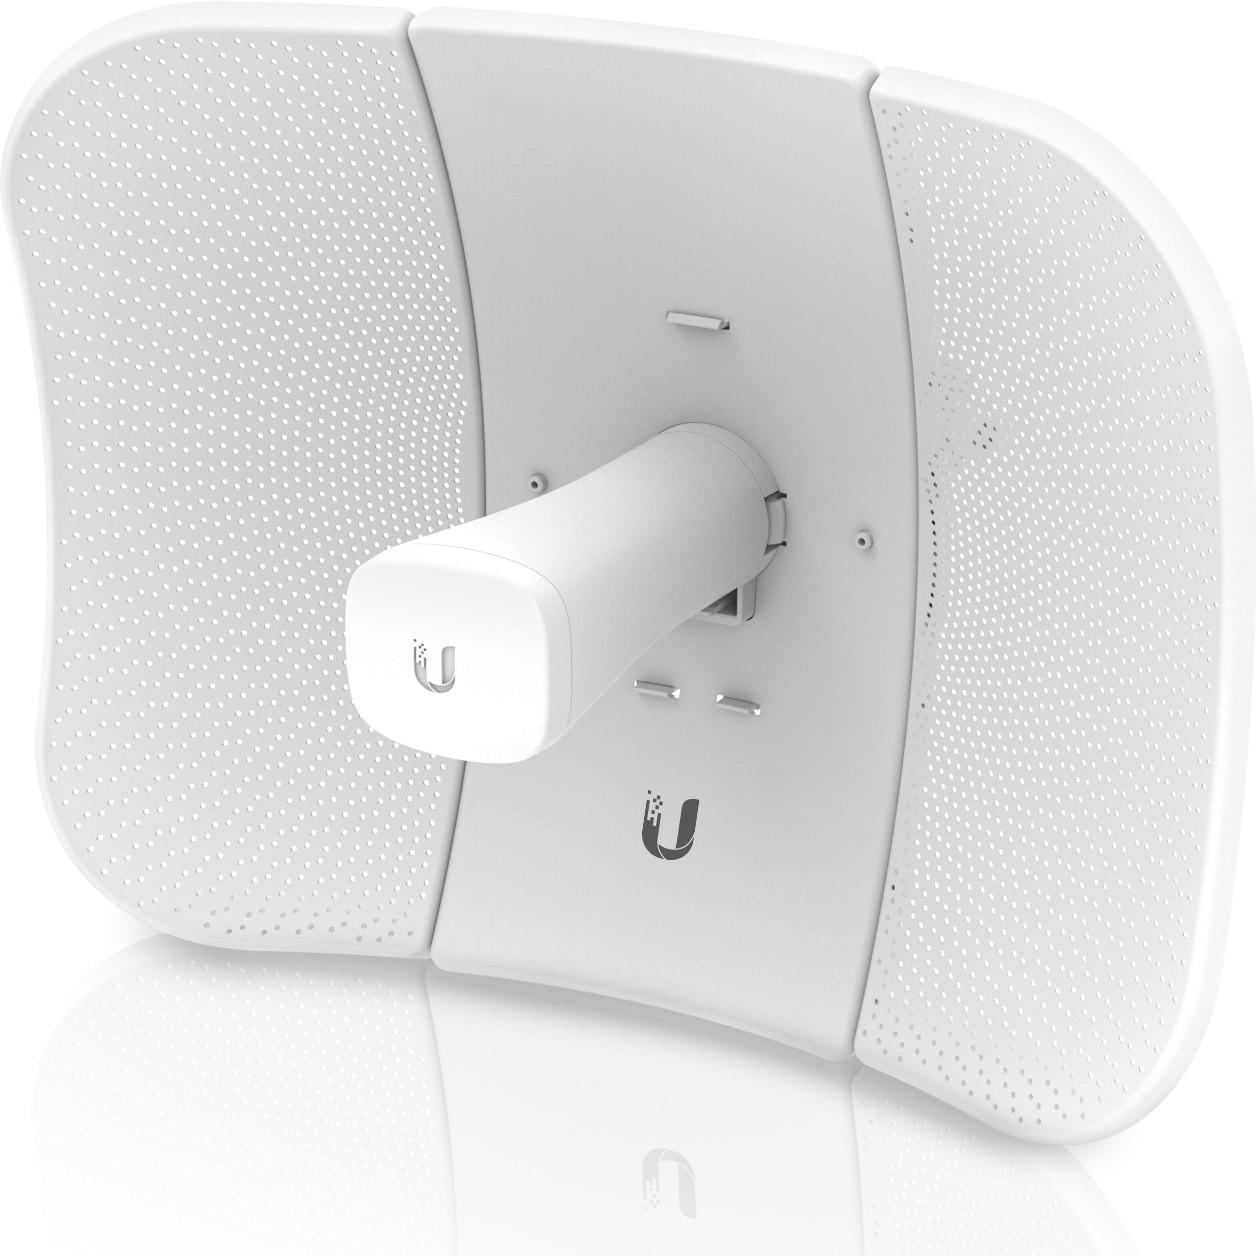 Ubiquiti LiteBeam Ac 23dBi 5GHz 802.11Ac Antenna